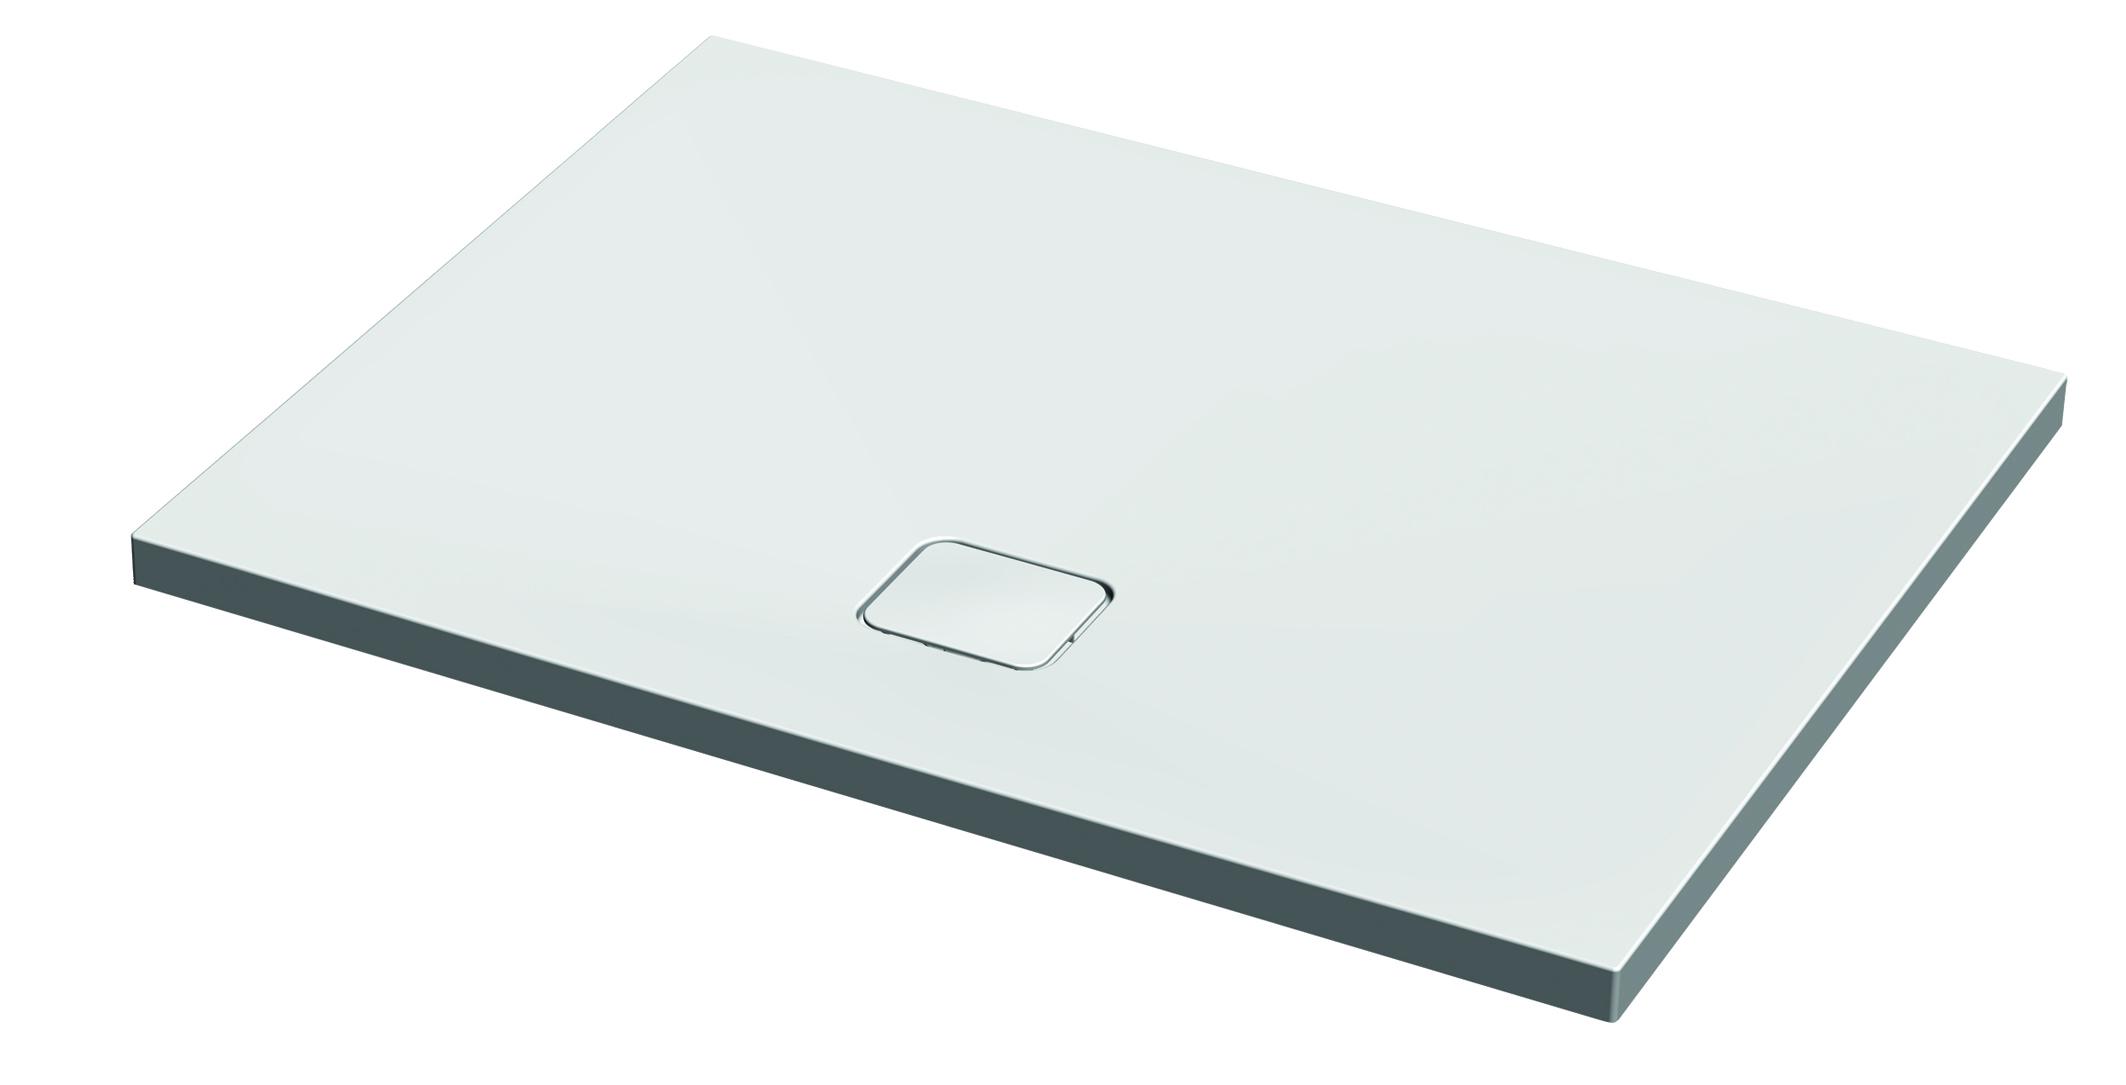 Riho design biasca vlakke douchebak for Wohnzimmertisch 90 x 120